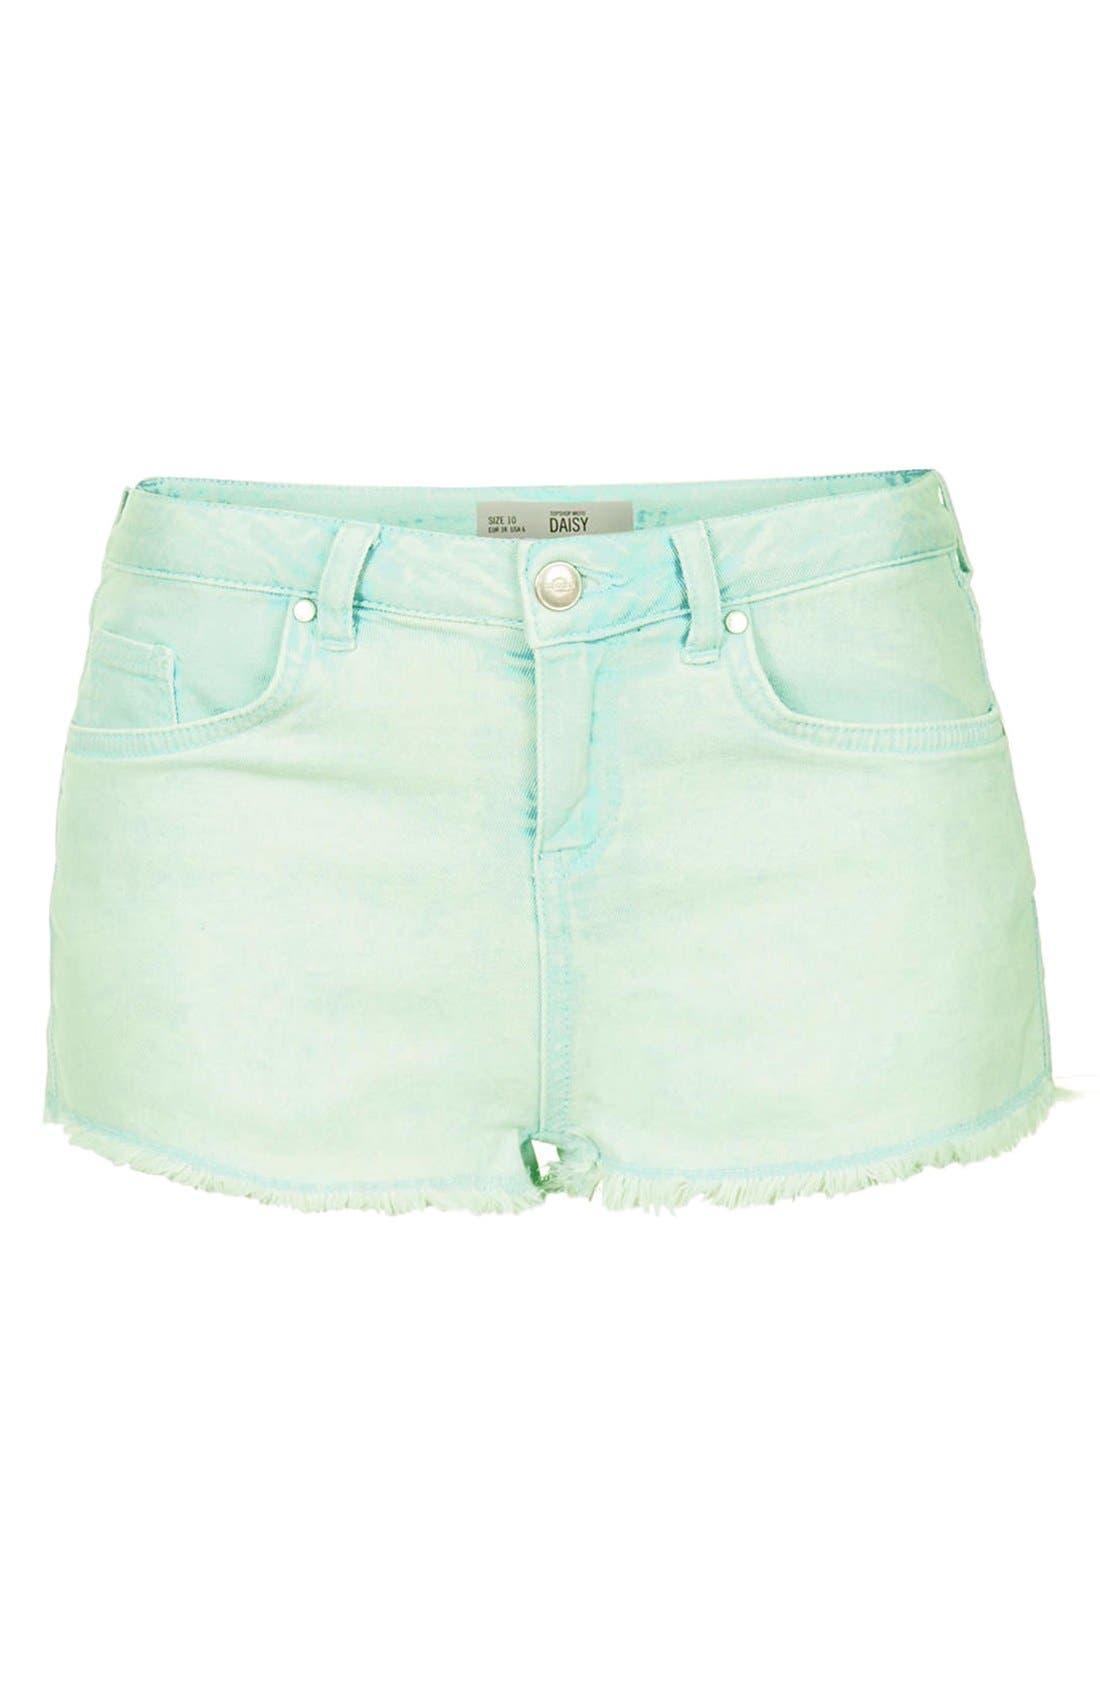 Alternate Image 3  - Topshop Moto 'Daisy' Denim Cutoff Shorts (Mint)